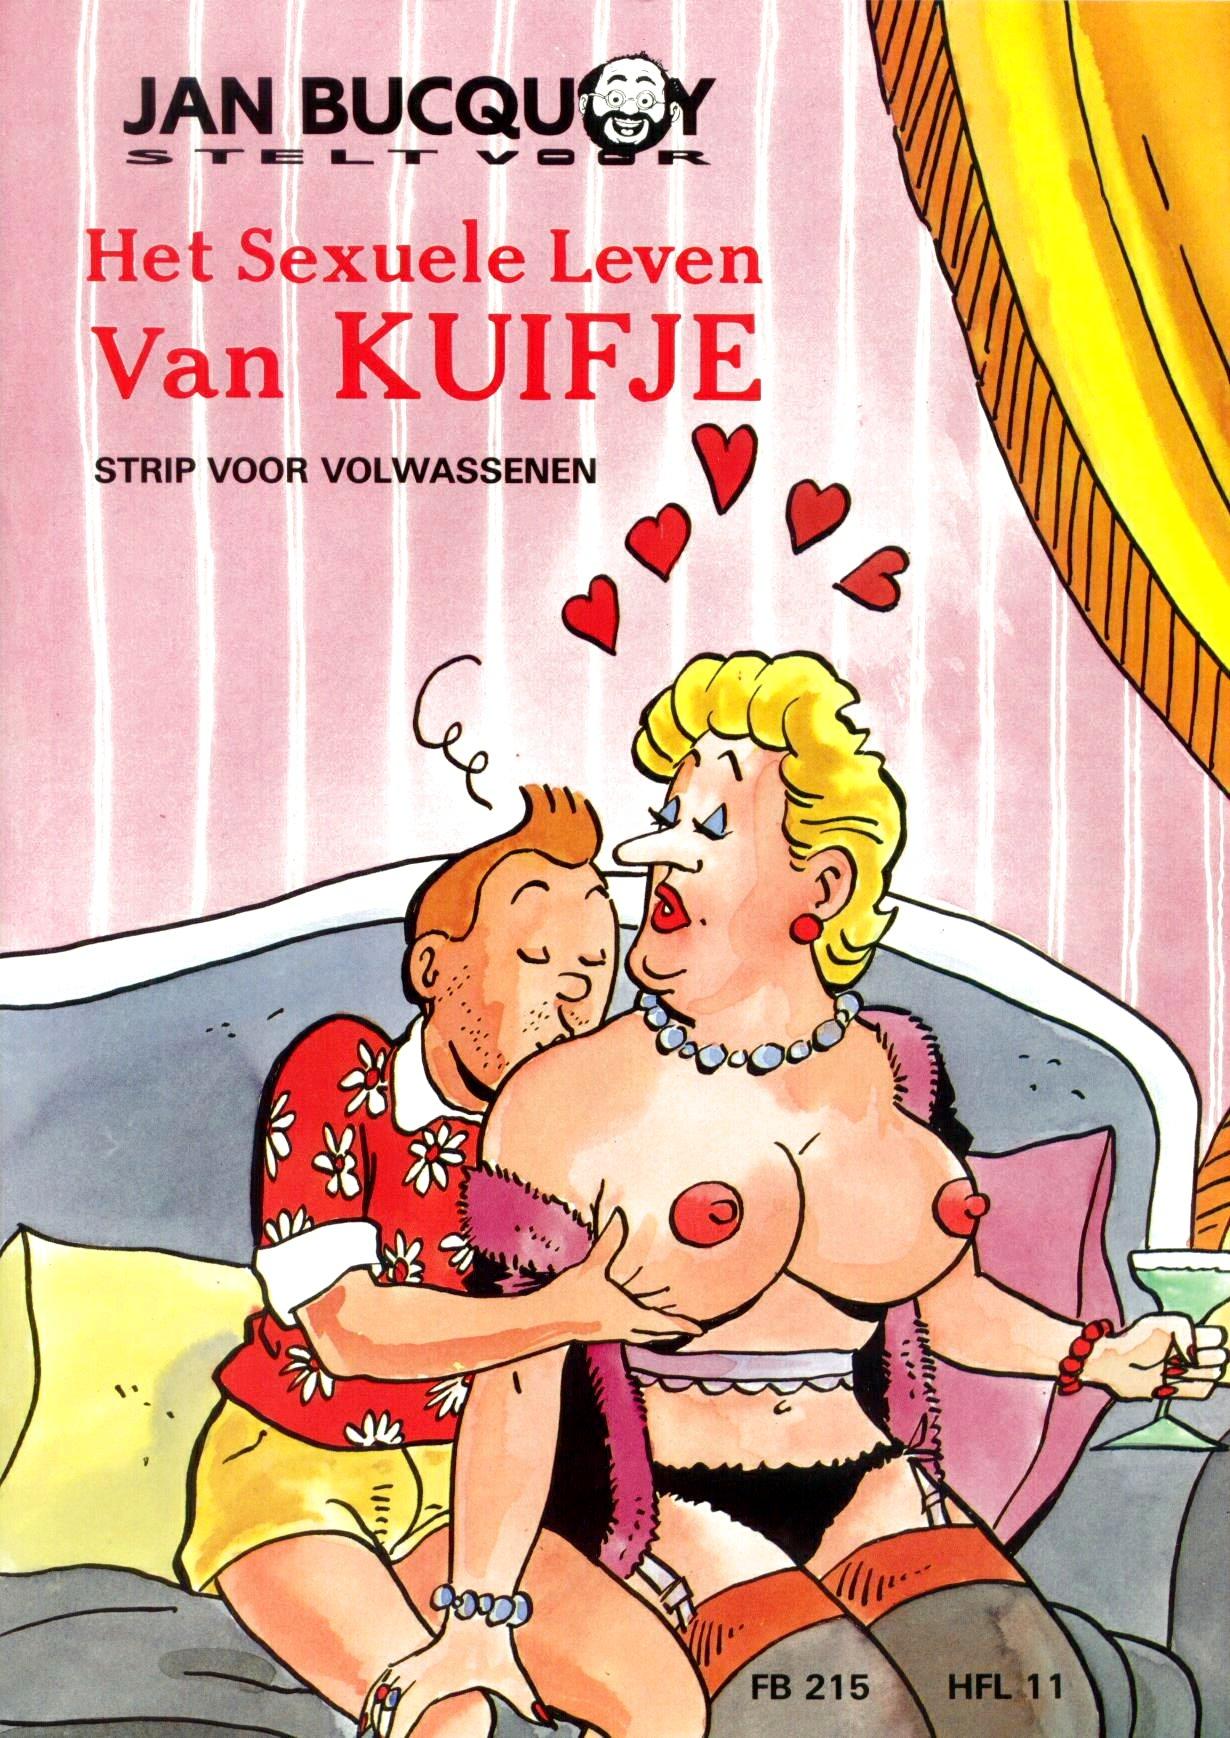 SureFap xxx porno The Adventures of Tintin - [Jan Bucquoy] - La Vie Sexuelle De Tintin - Het Sexuele Leven Van Kuifje (1993) - Deel 1&2 [FULL 64 PAGE]